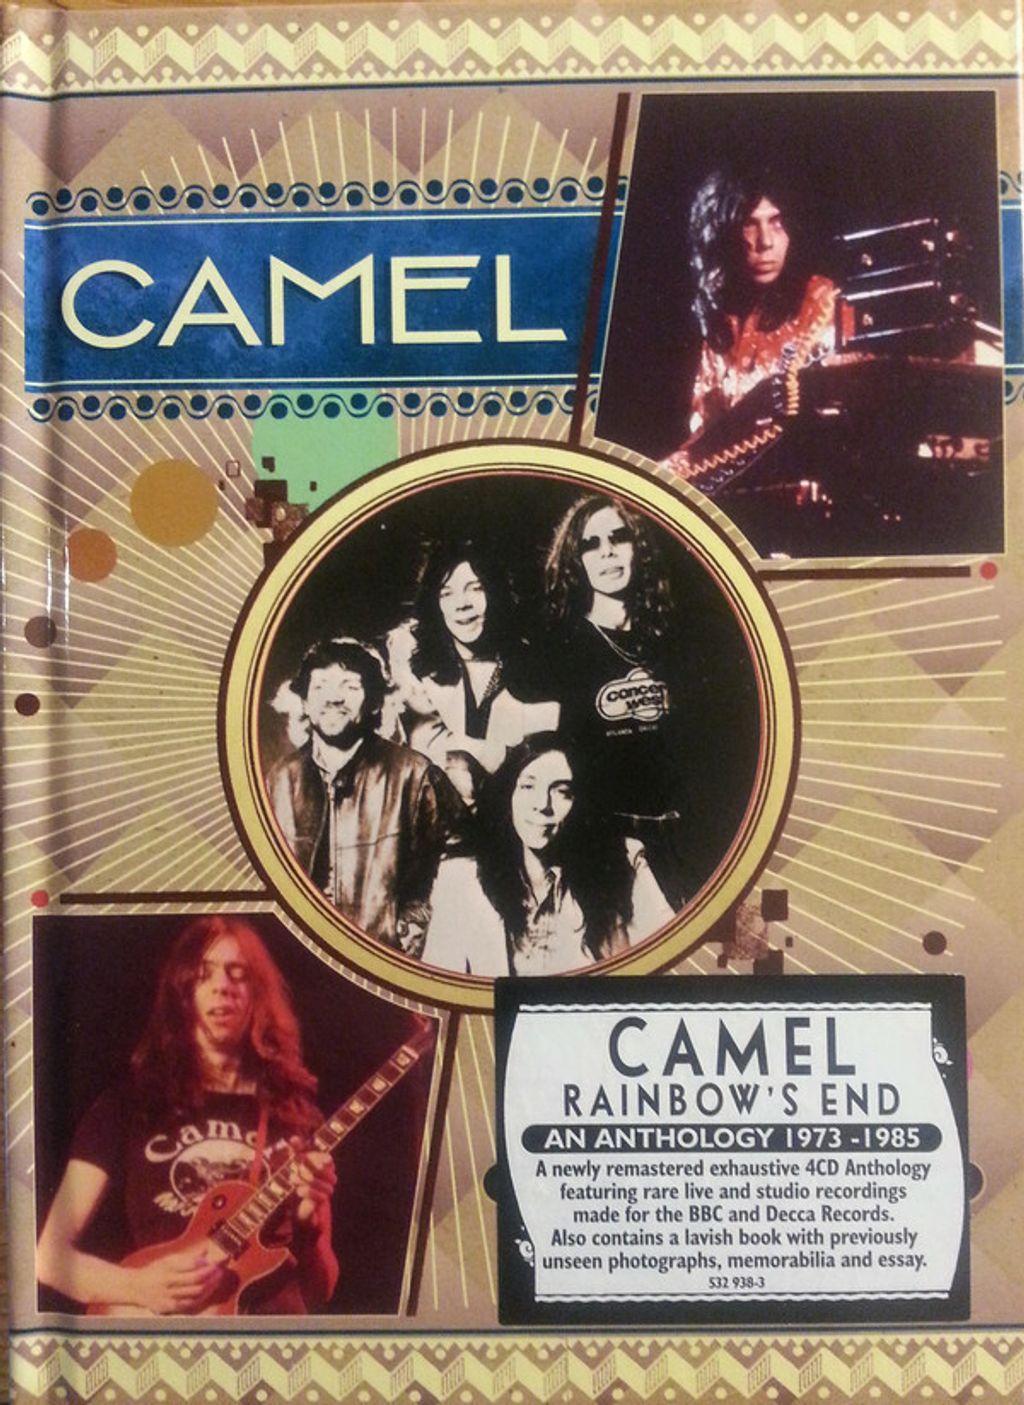 (Used) CAMEL Rainbow's End - An Anthology 1973-1985 4CD.jpg